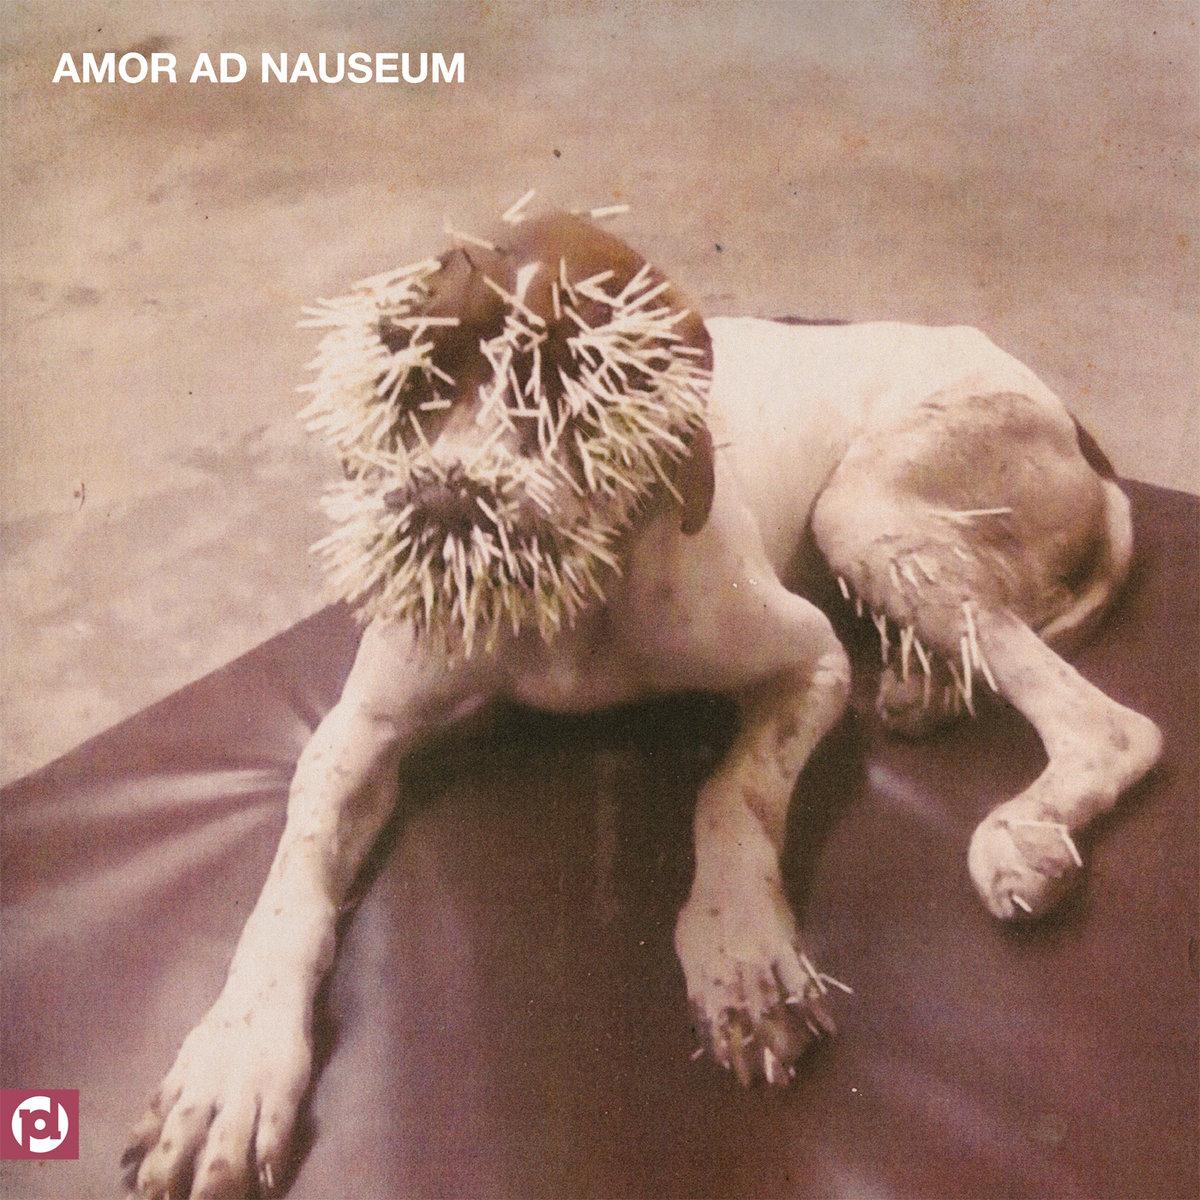 AAN - Amor Ad Nauseam - production / engineering / mixing